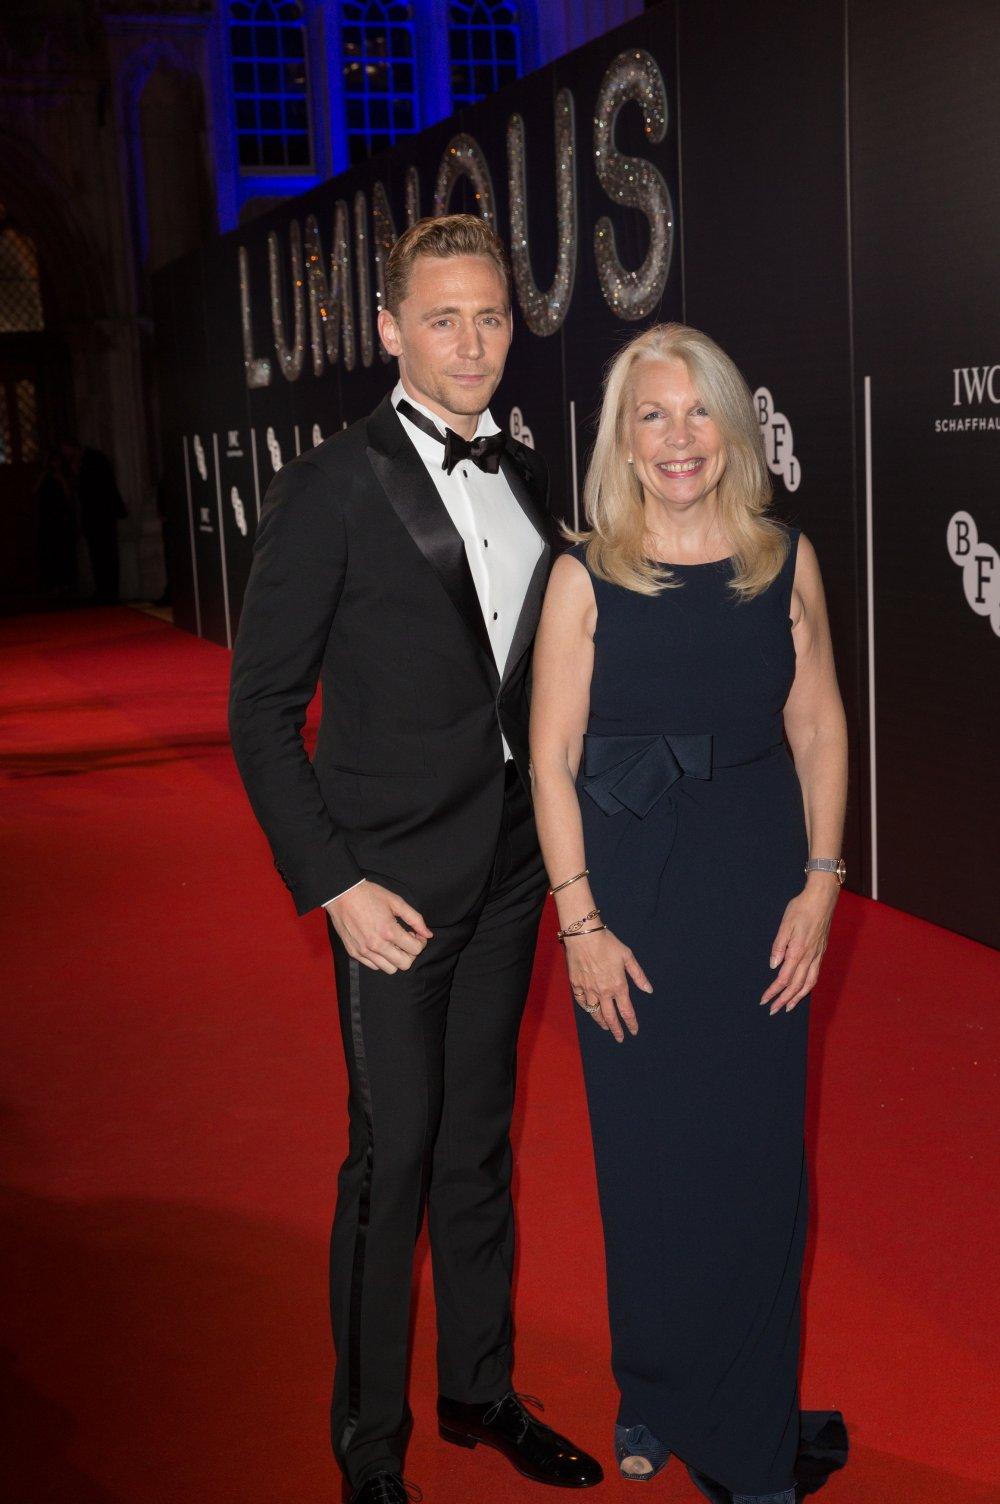 Tom Hiddleston and BFI Chief Executive Amanda Nevill attends the BFI LUMINOUS gala 2015